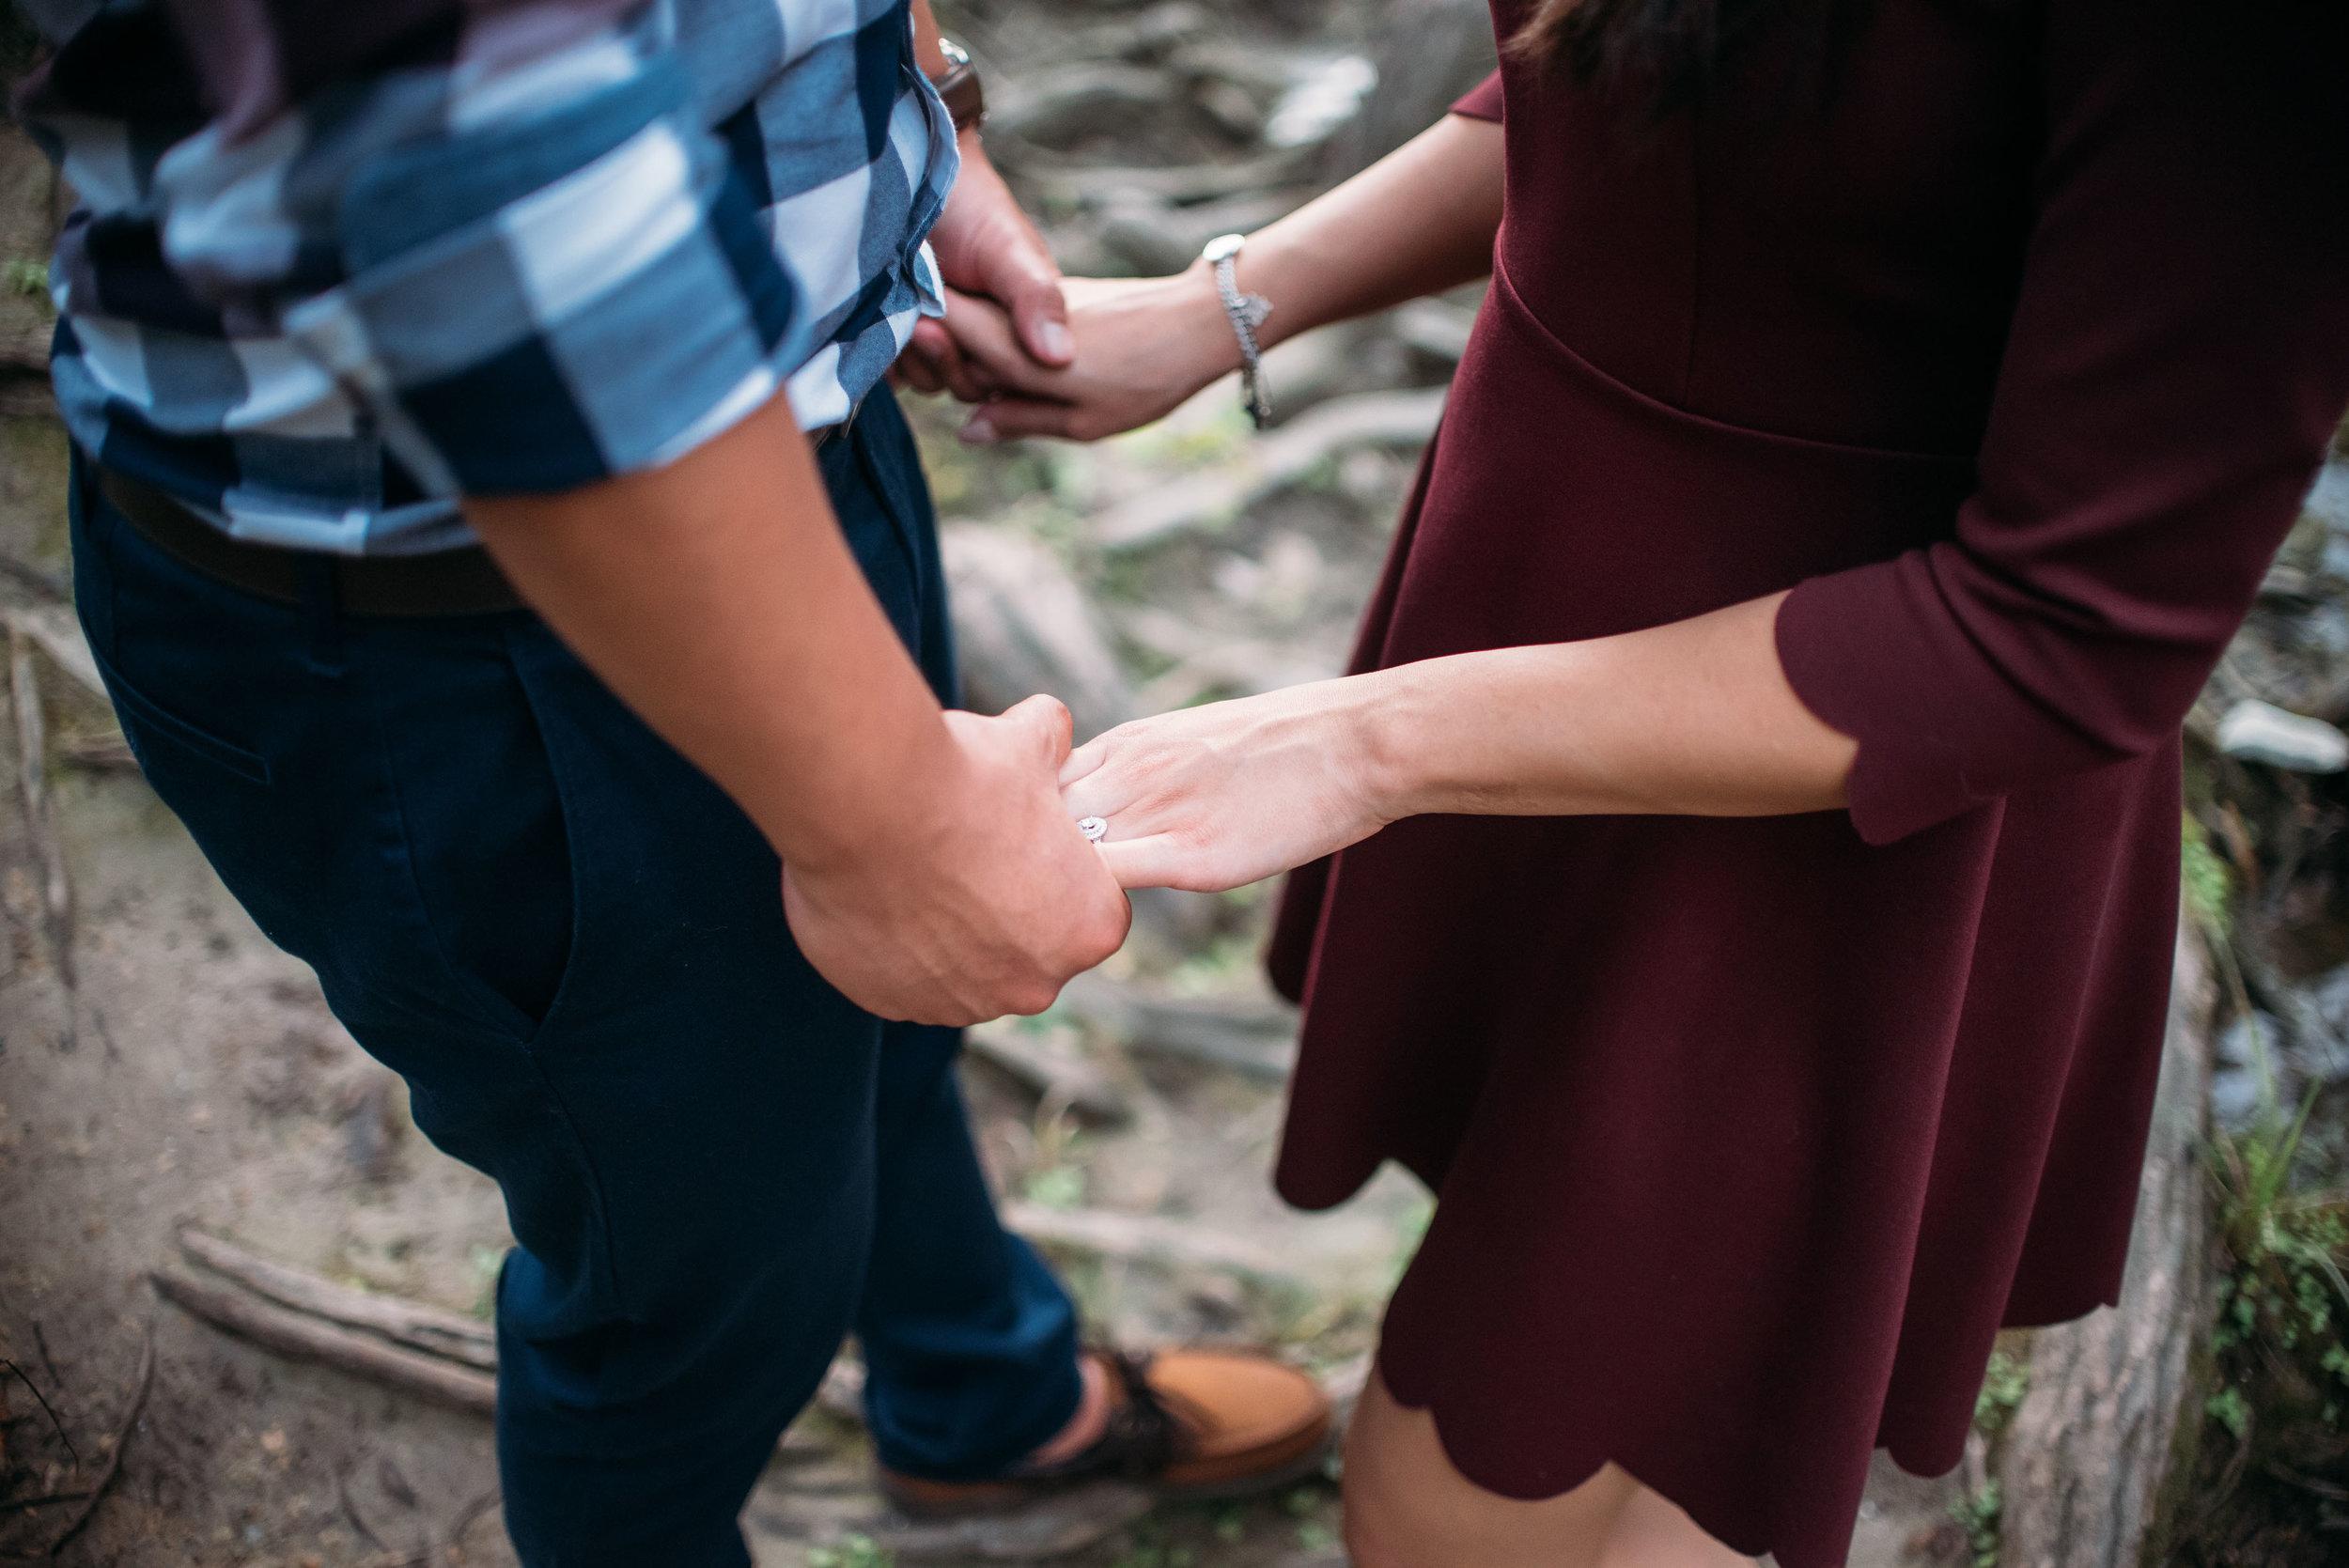 McKinneyStateFalls_Engagement_WeddingPhotographer_007.jpg